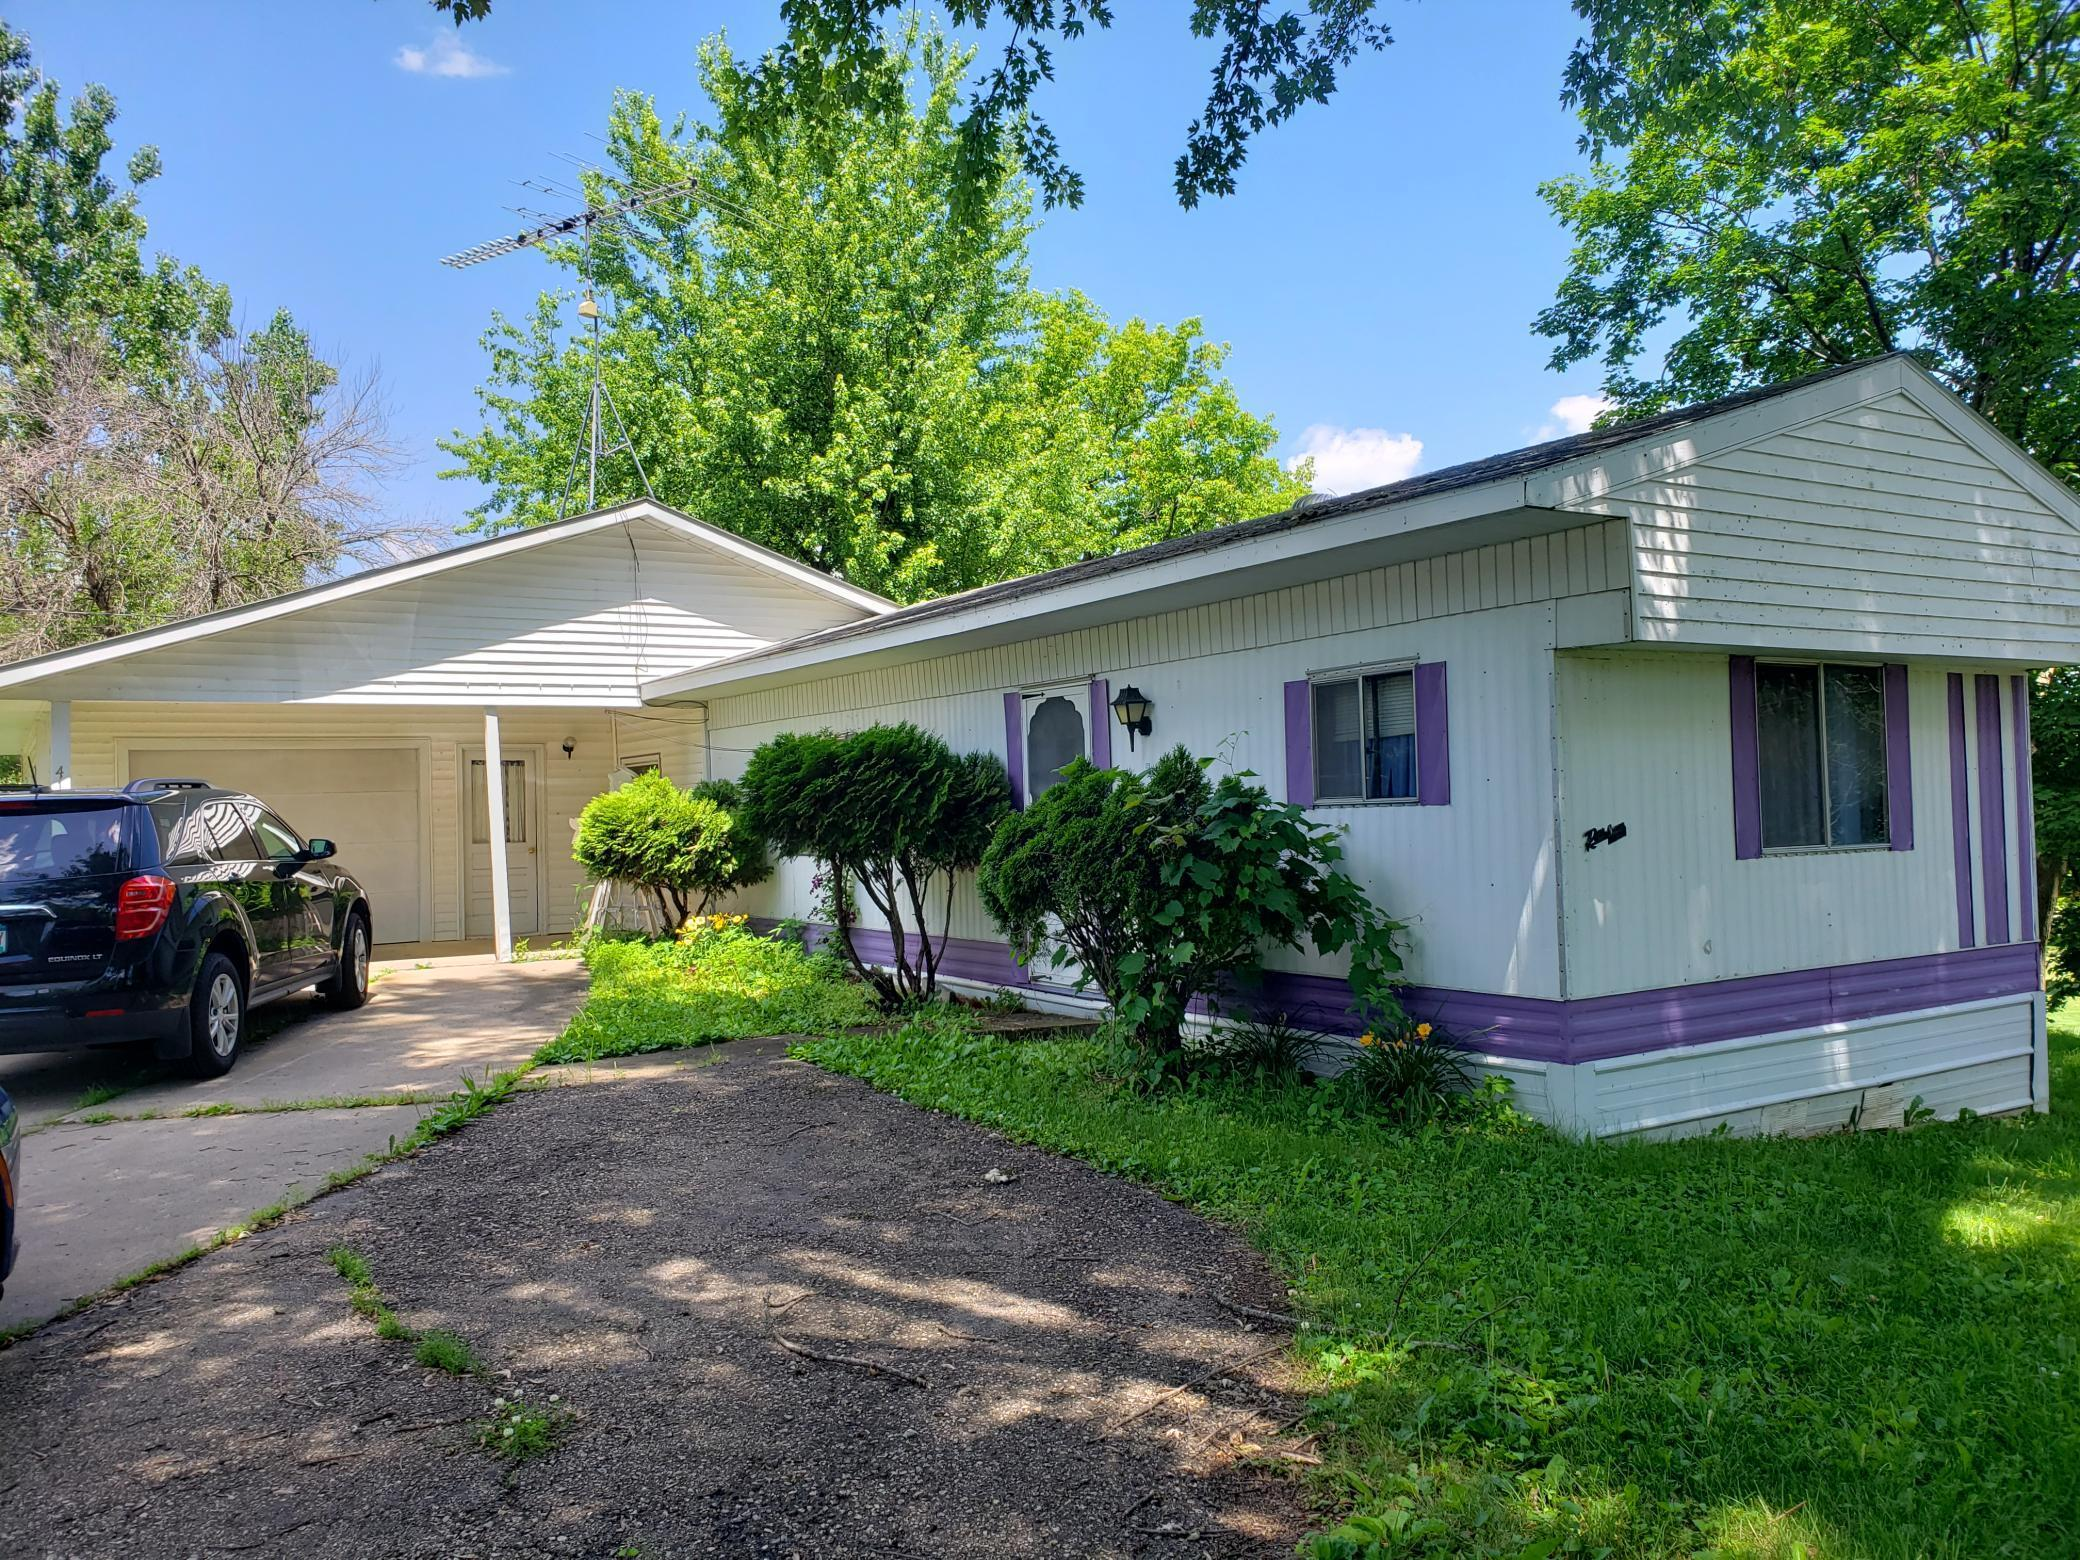 415 1st Property Photo - Kellogg, MN real estate listing